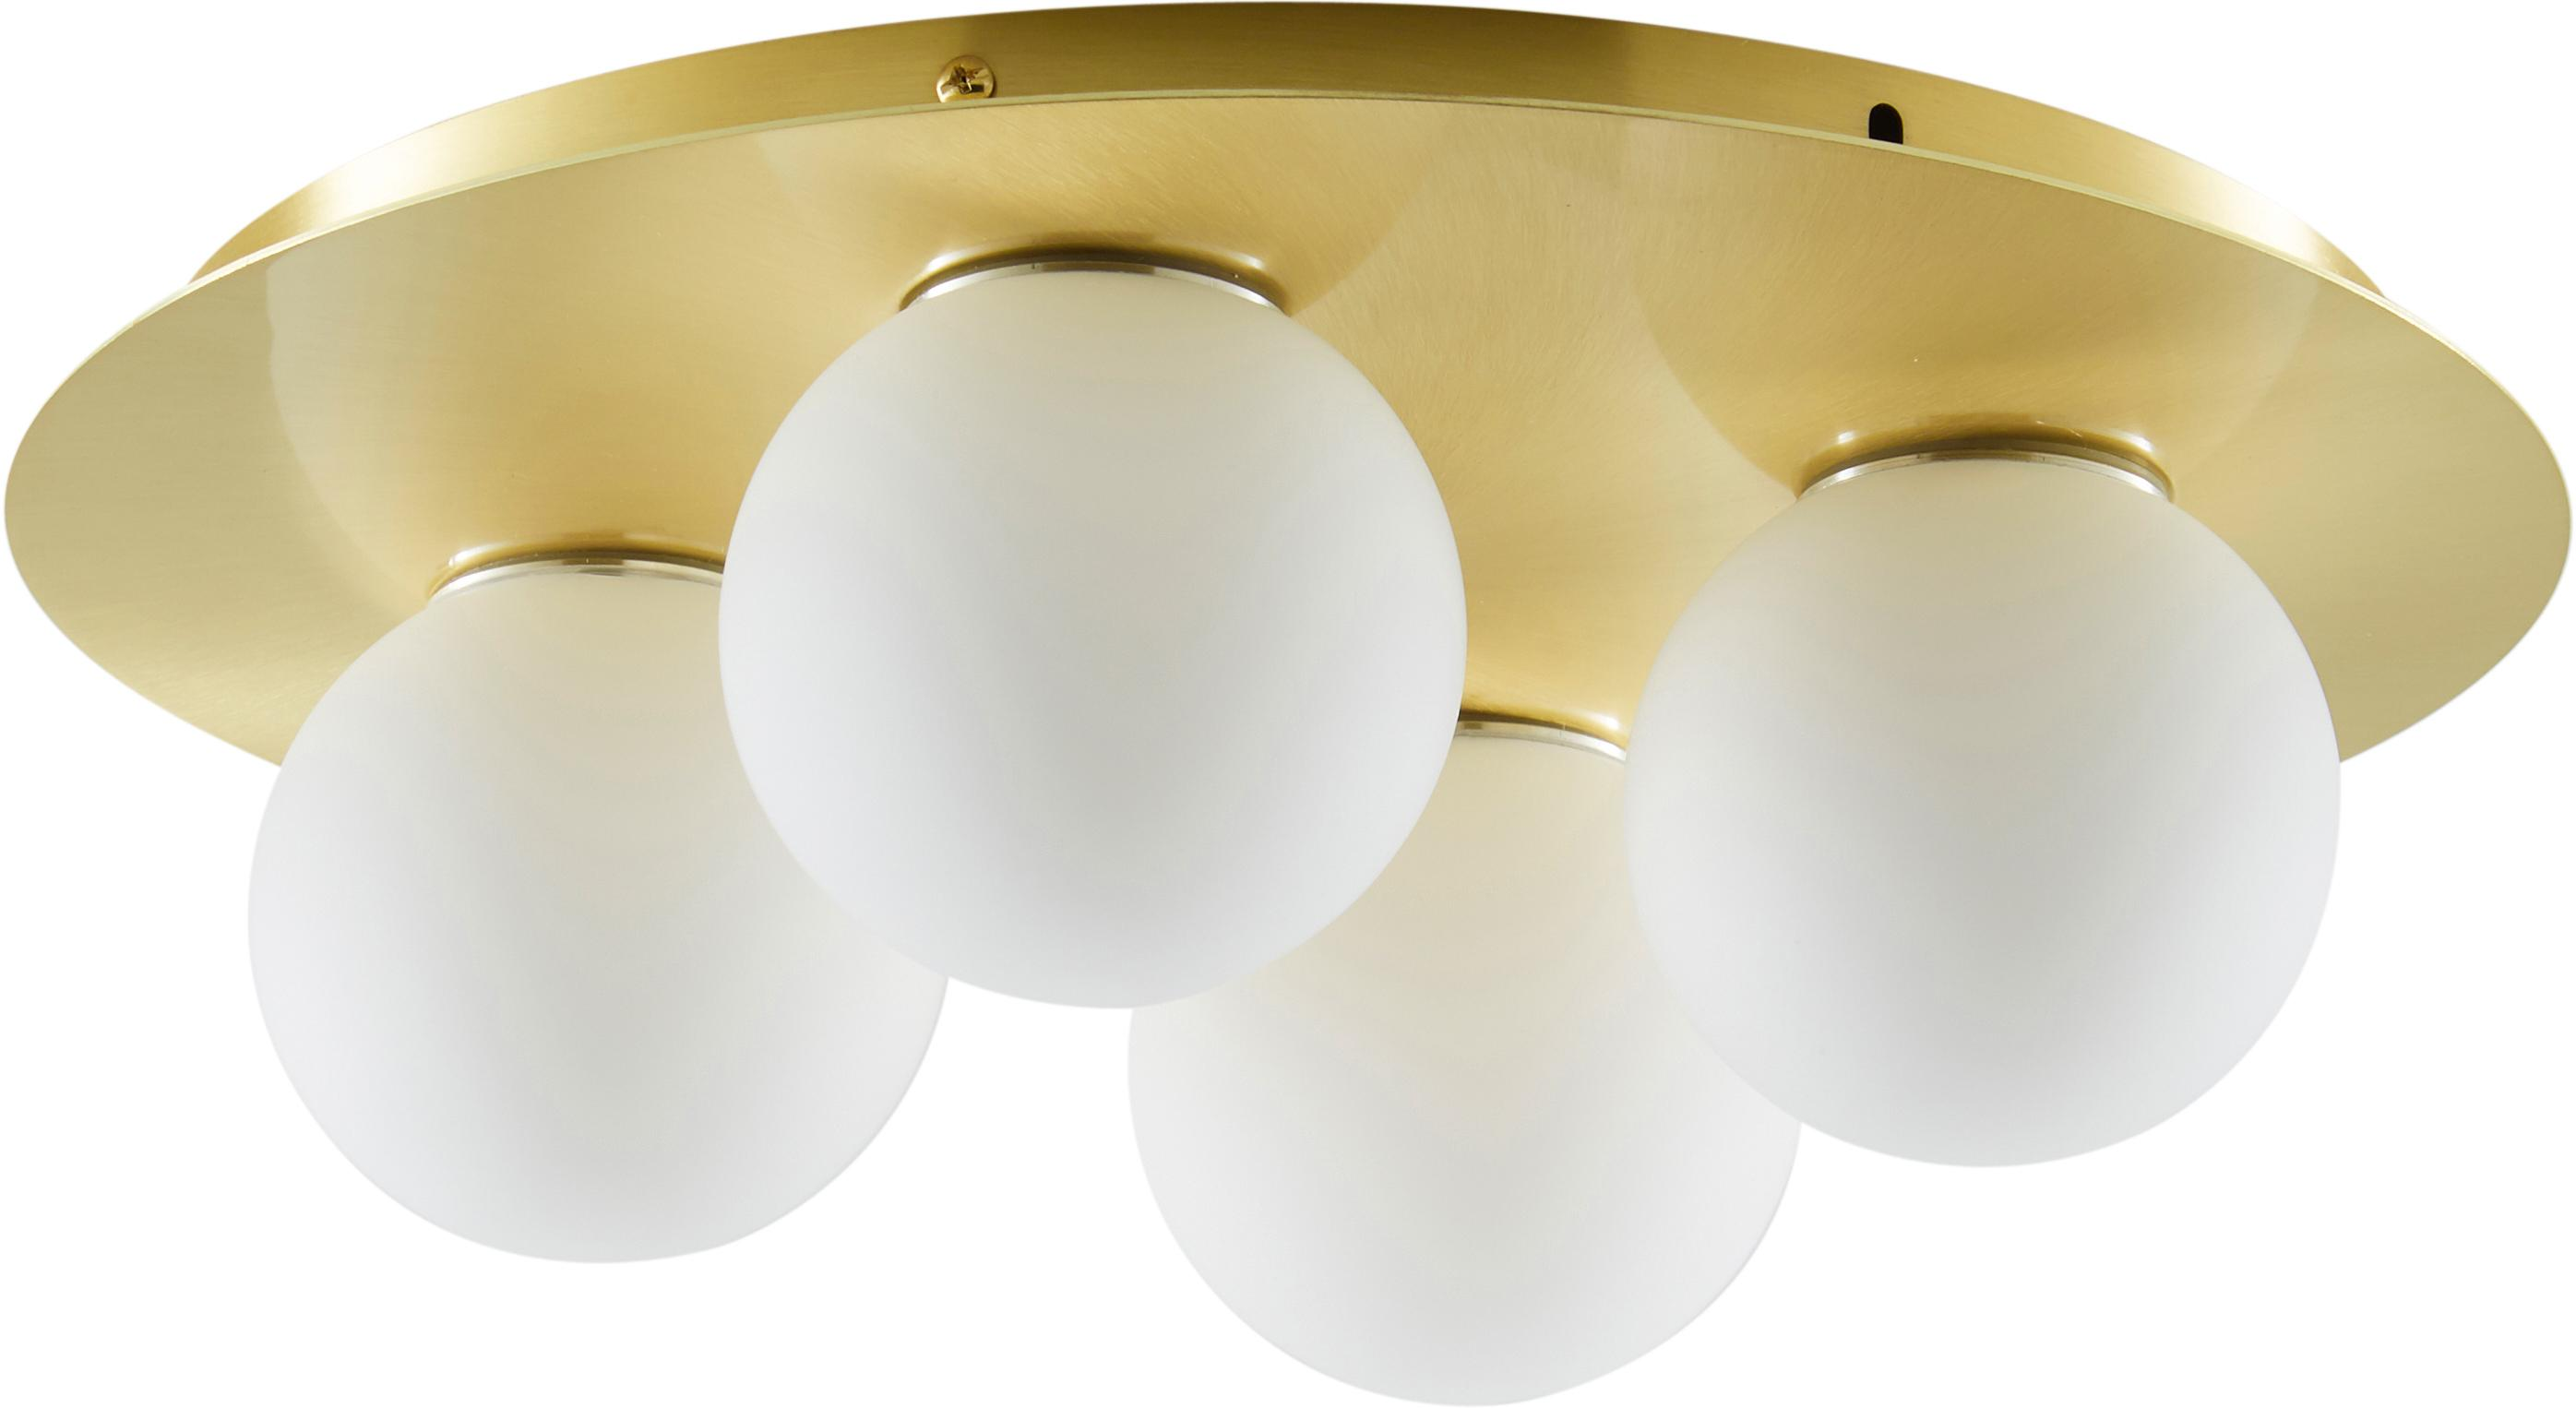 Lampada da soffitto Hitch, Paralume: vetro, Baldacchino e rilegatura: ottone opaco Paralume: bianco, Ø 36 x Alt. 12 cm